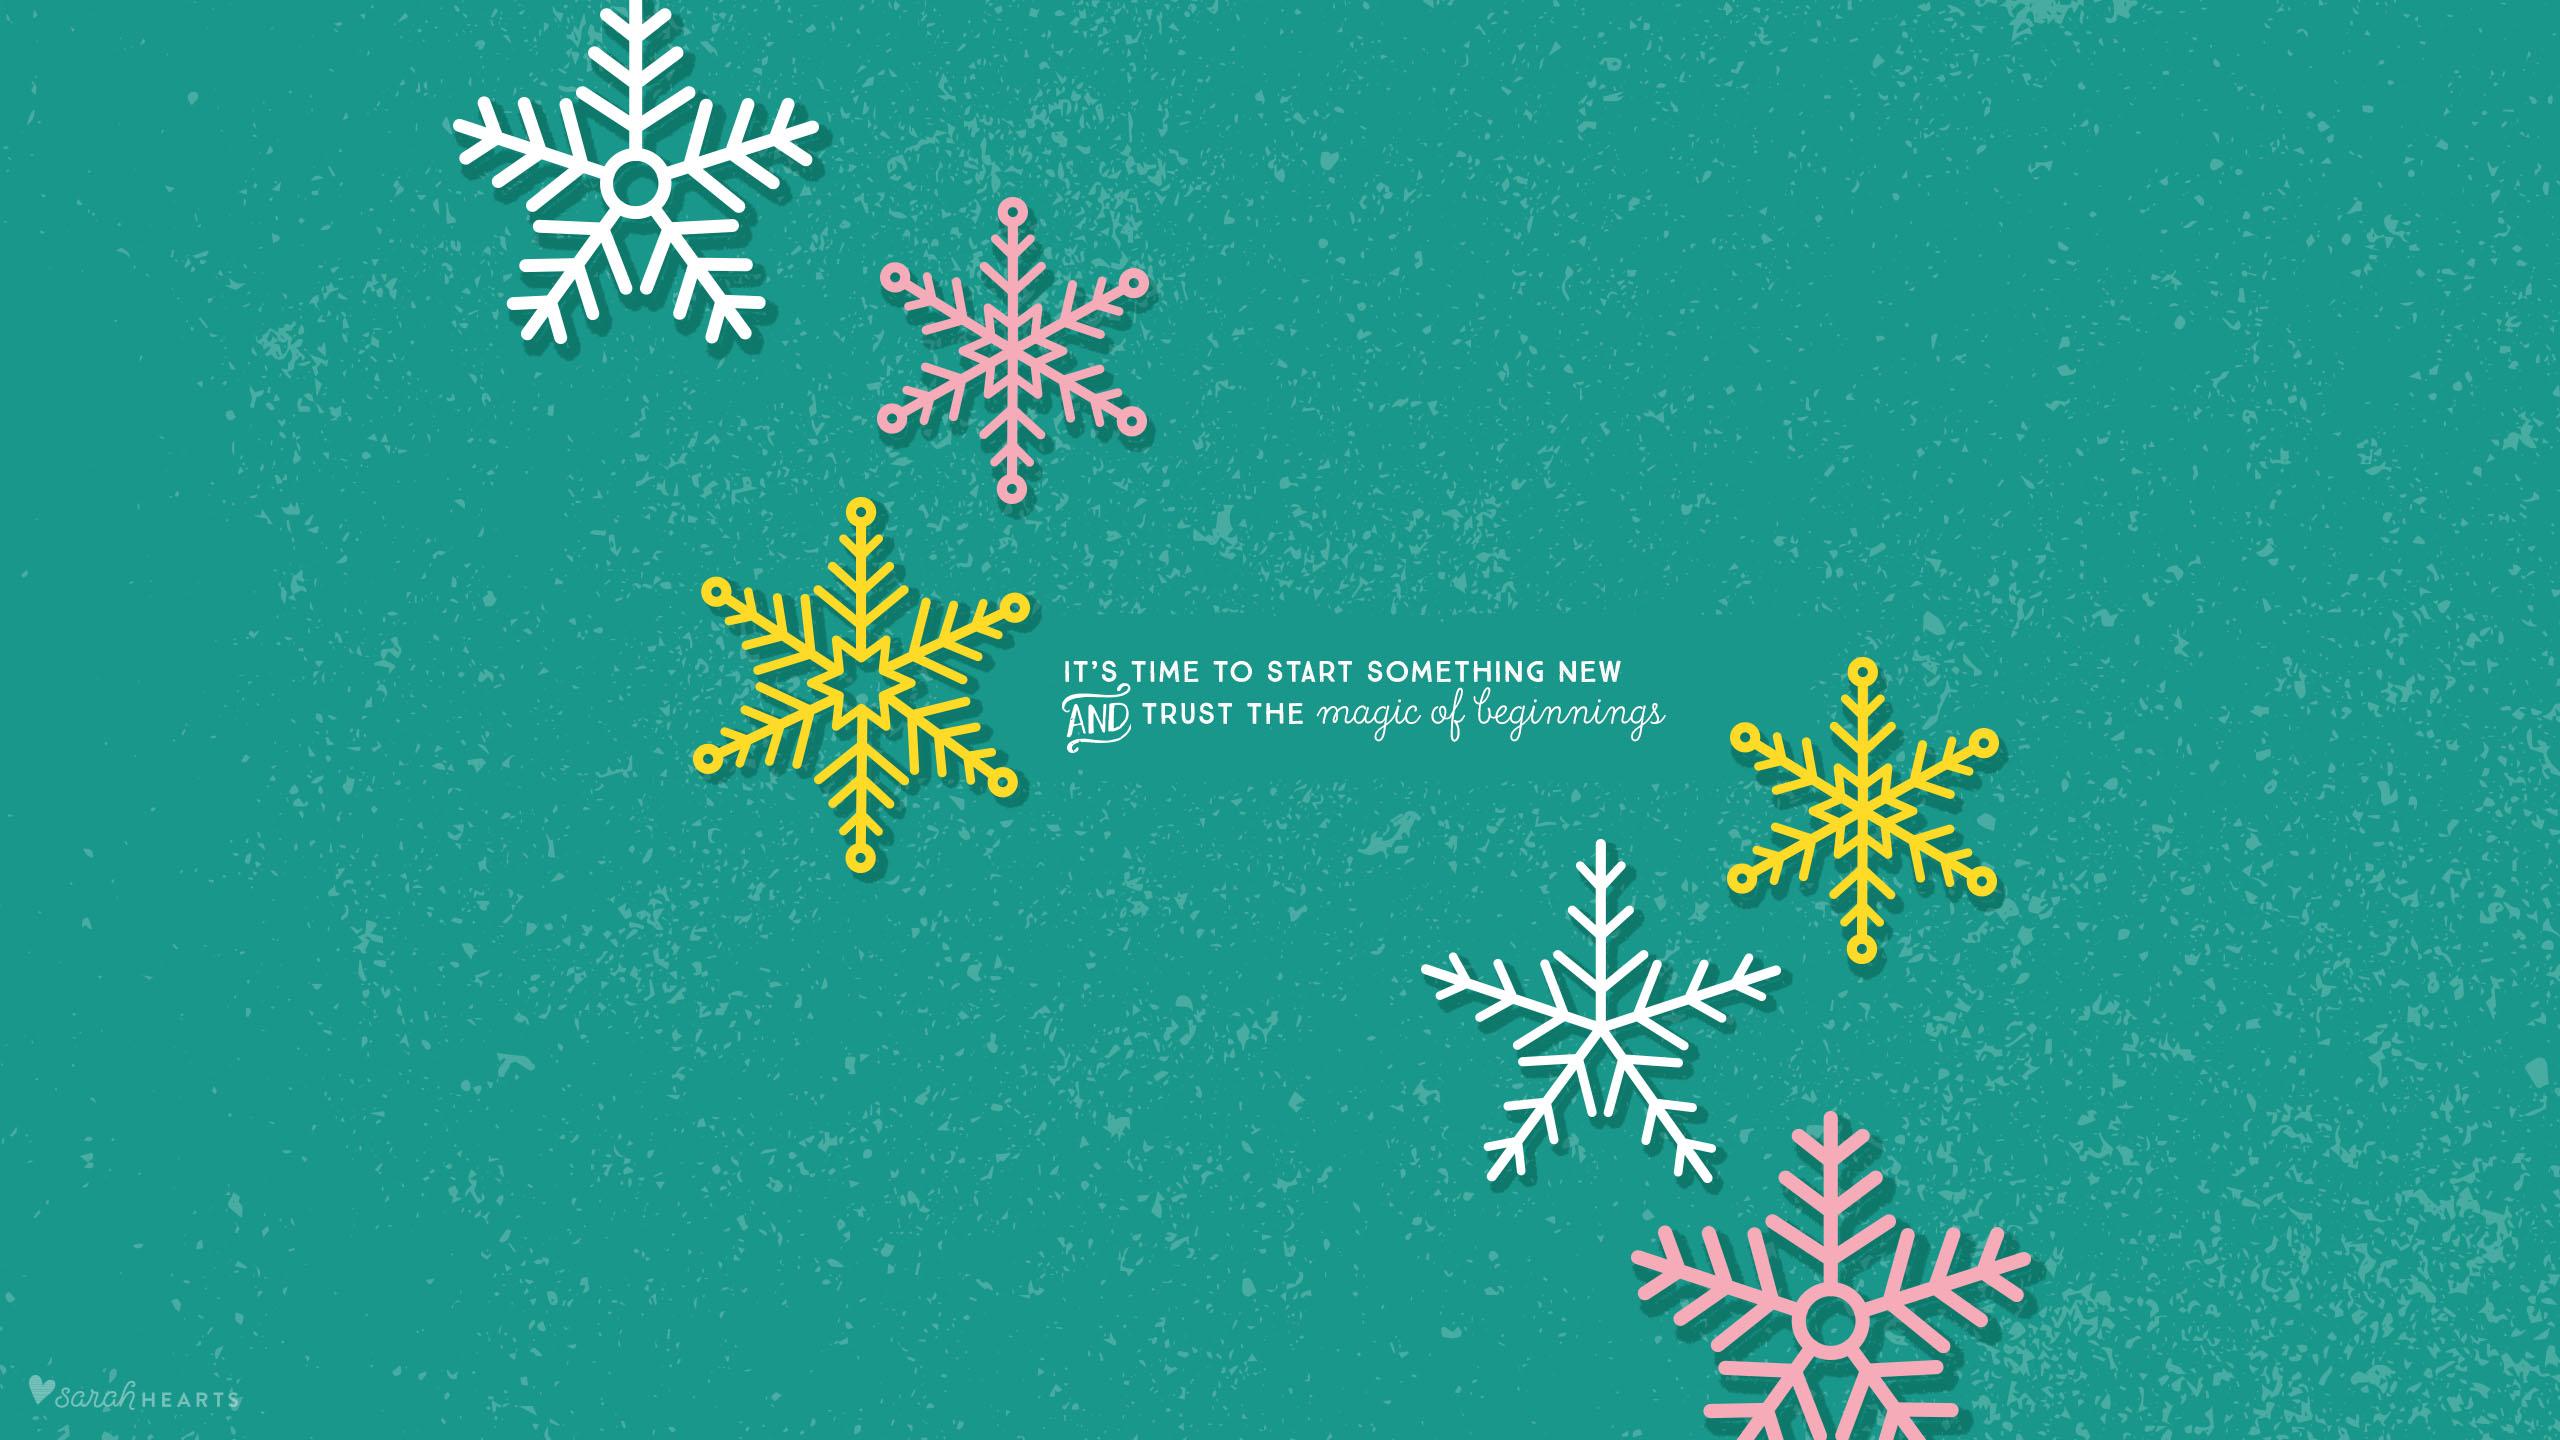 January 2016 calendar wallpaper sarah hearts for Home wallpaper quotes